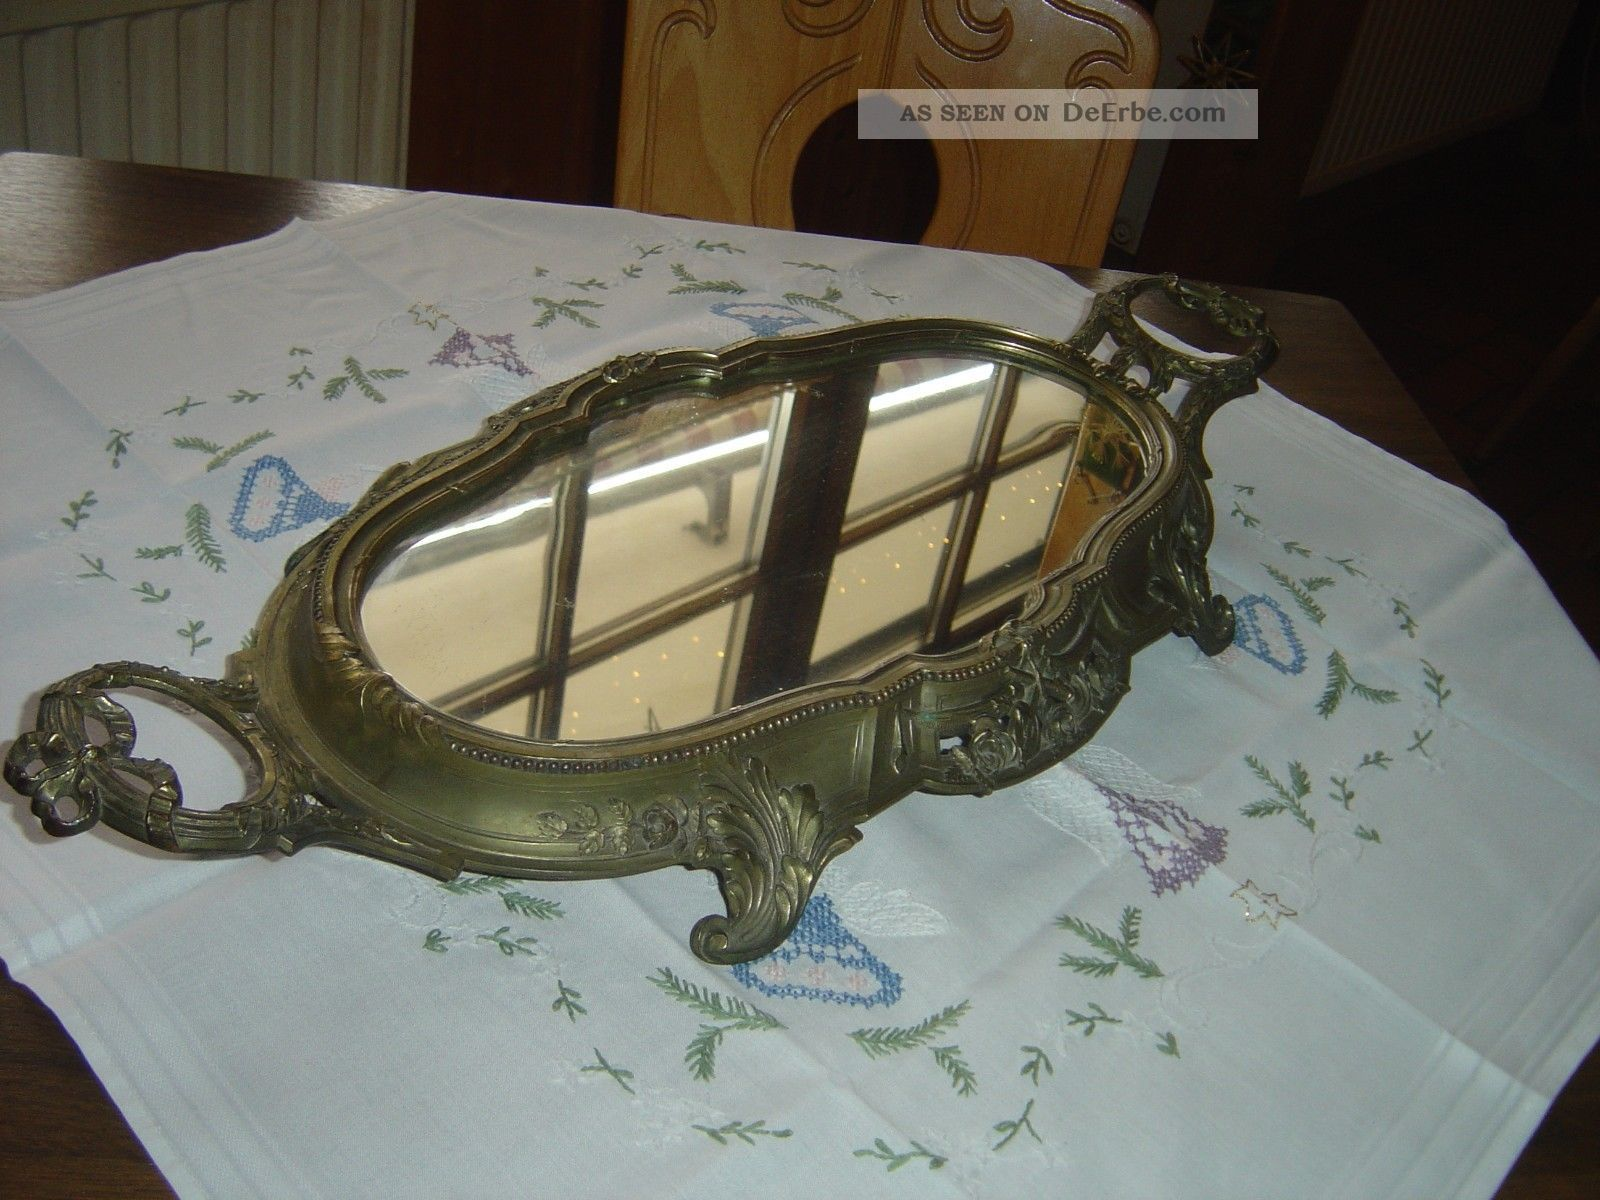 Orfevrerie dilecta antikes tableau mit spiegel 1920 art deco jugendstil - Deco spiegel ...